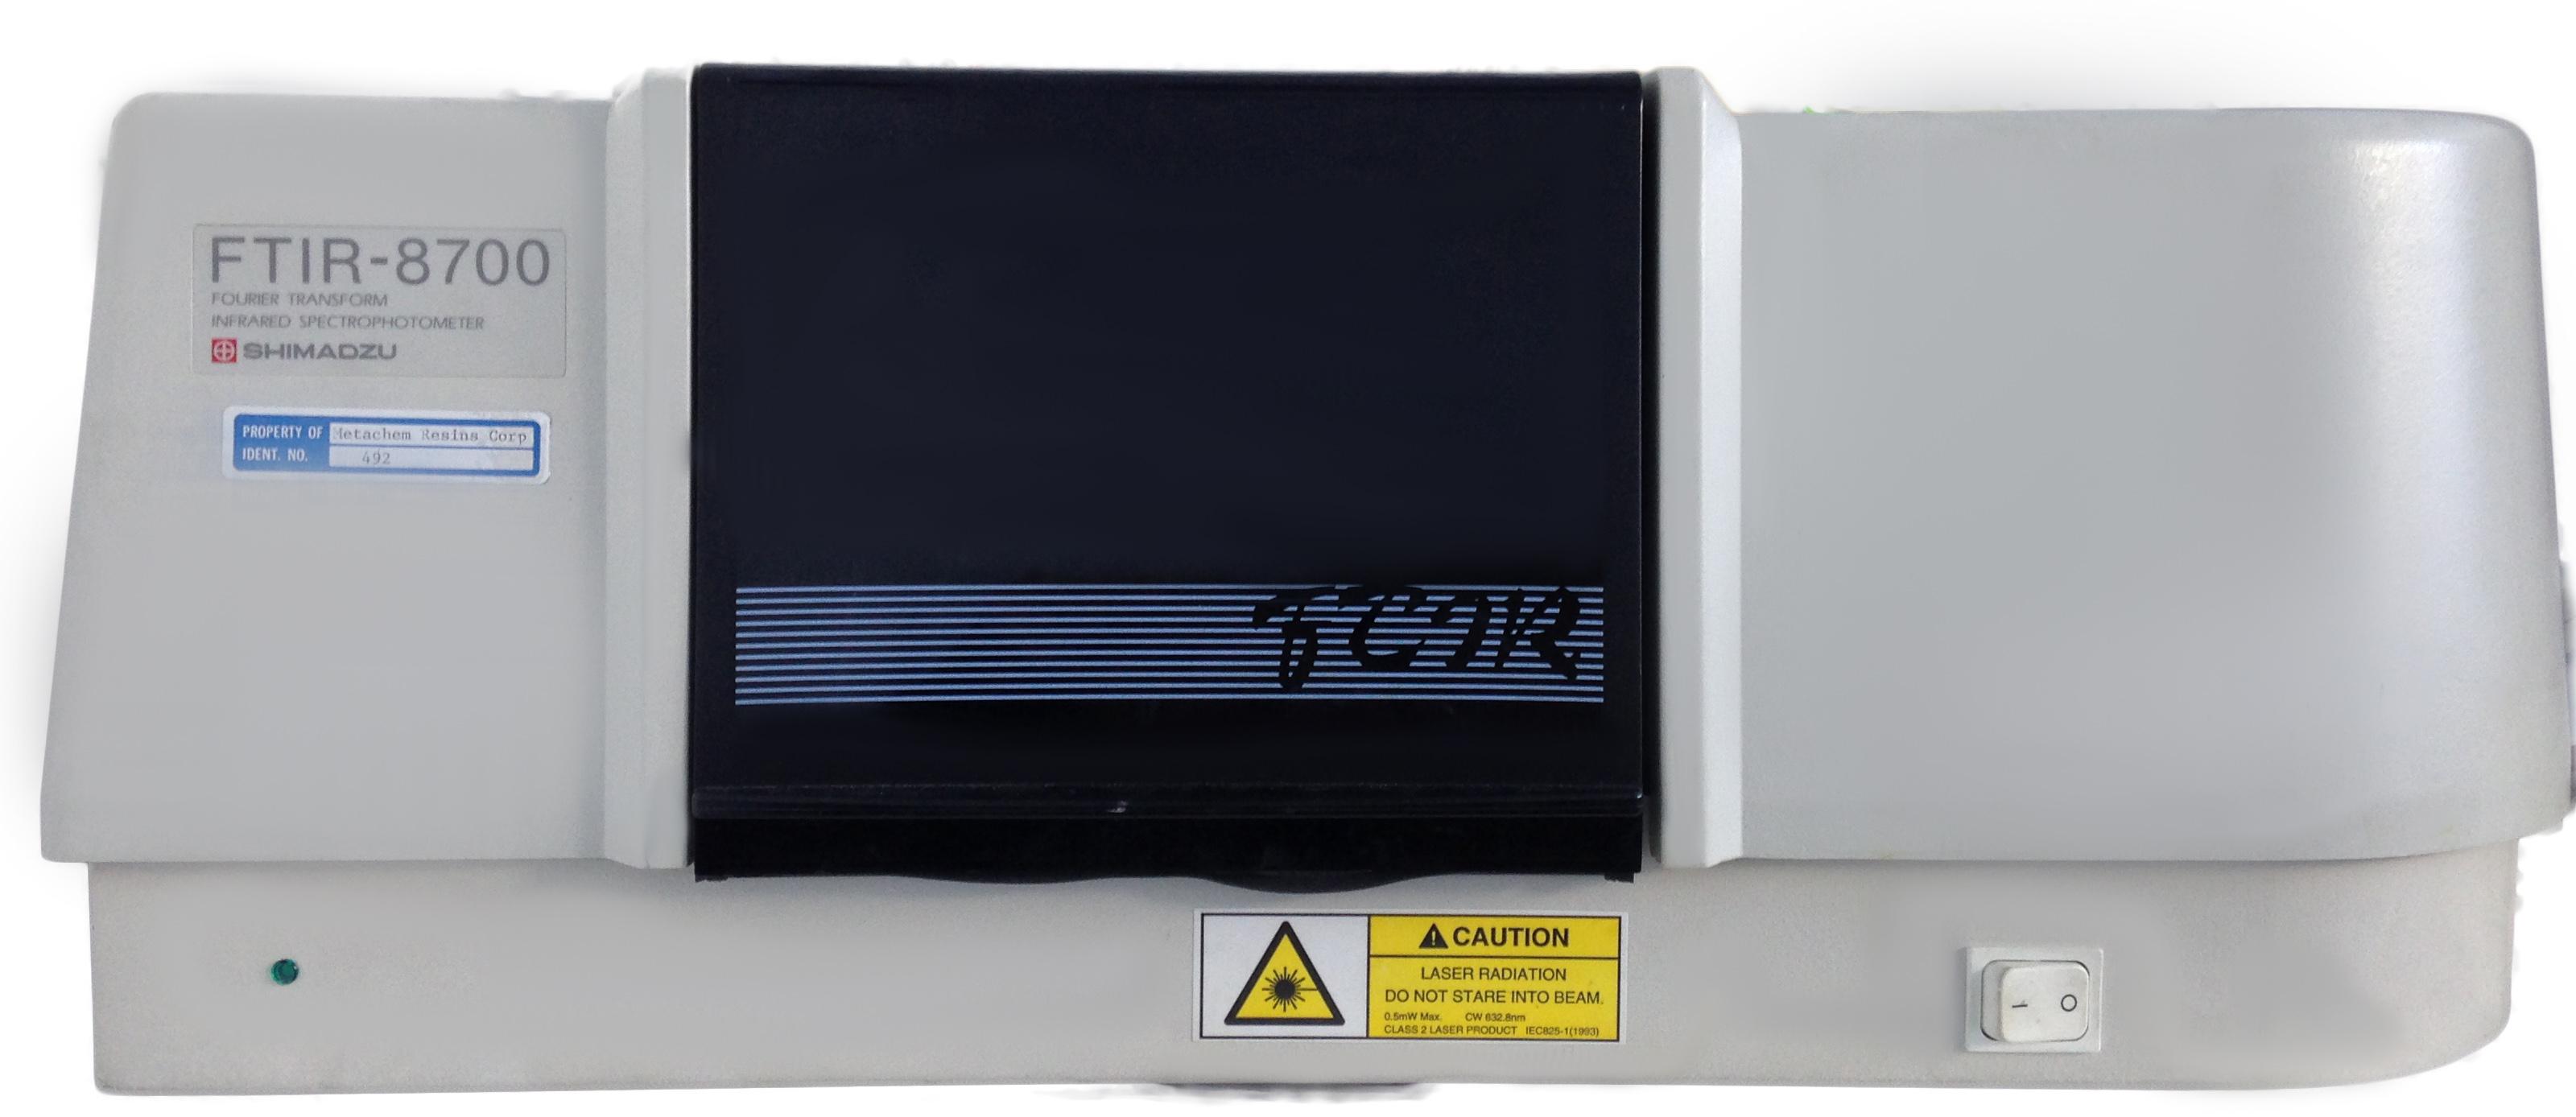 Shimadzu FTIR 8700 Spectroscopy, Mereco R&D